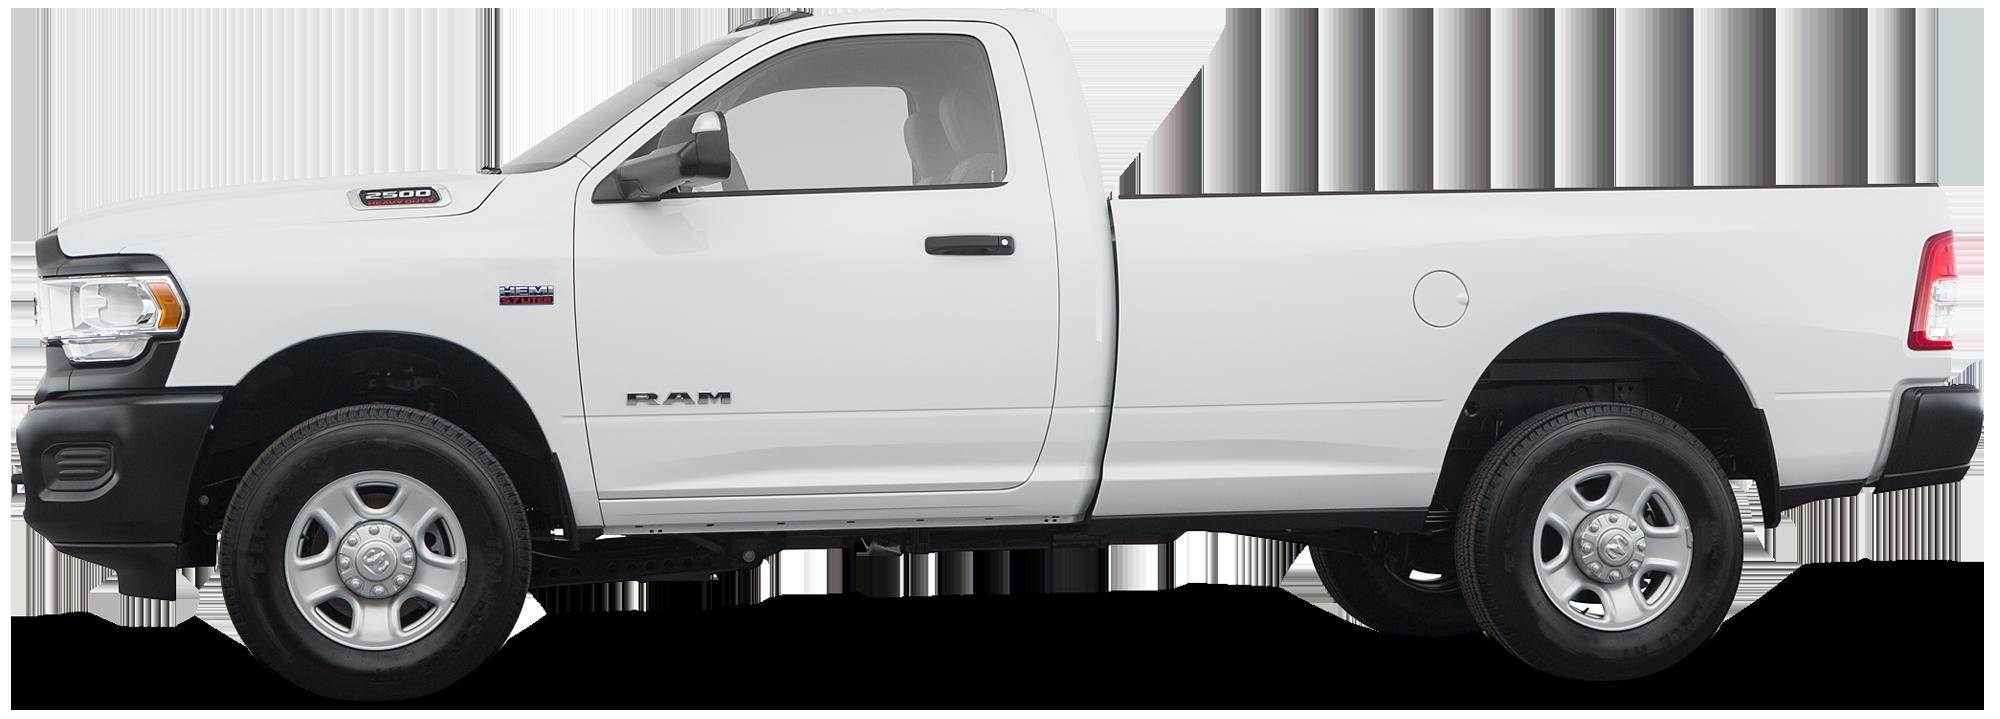 2021 Ram 2500 Truck Tradesman